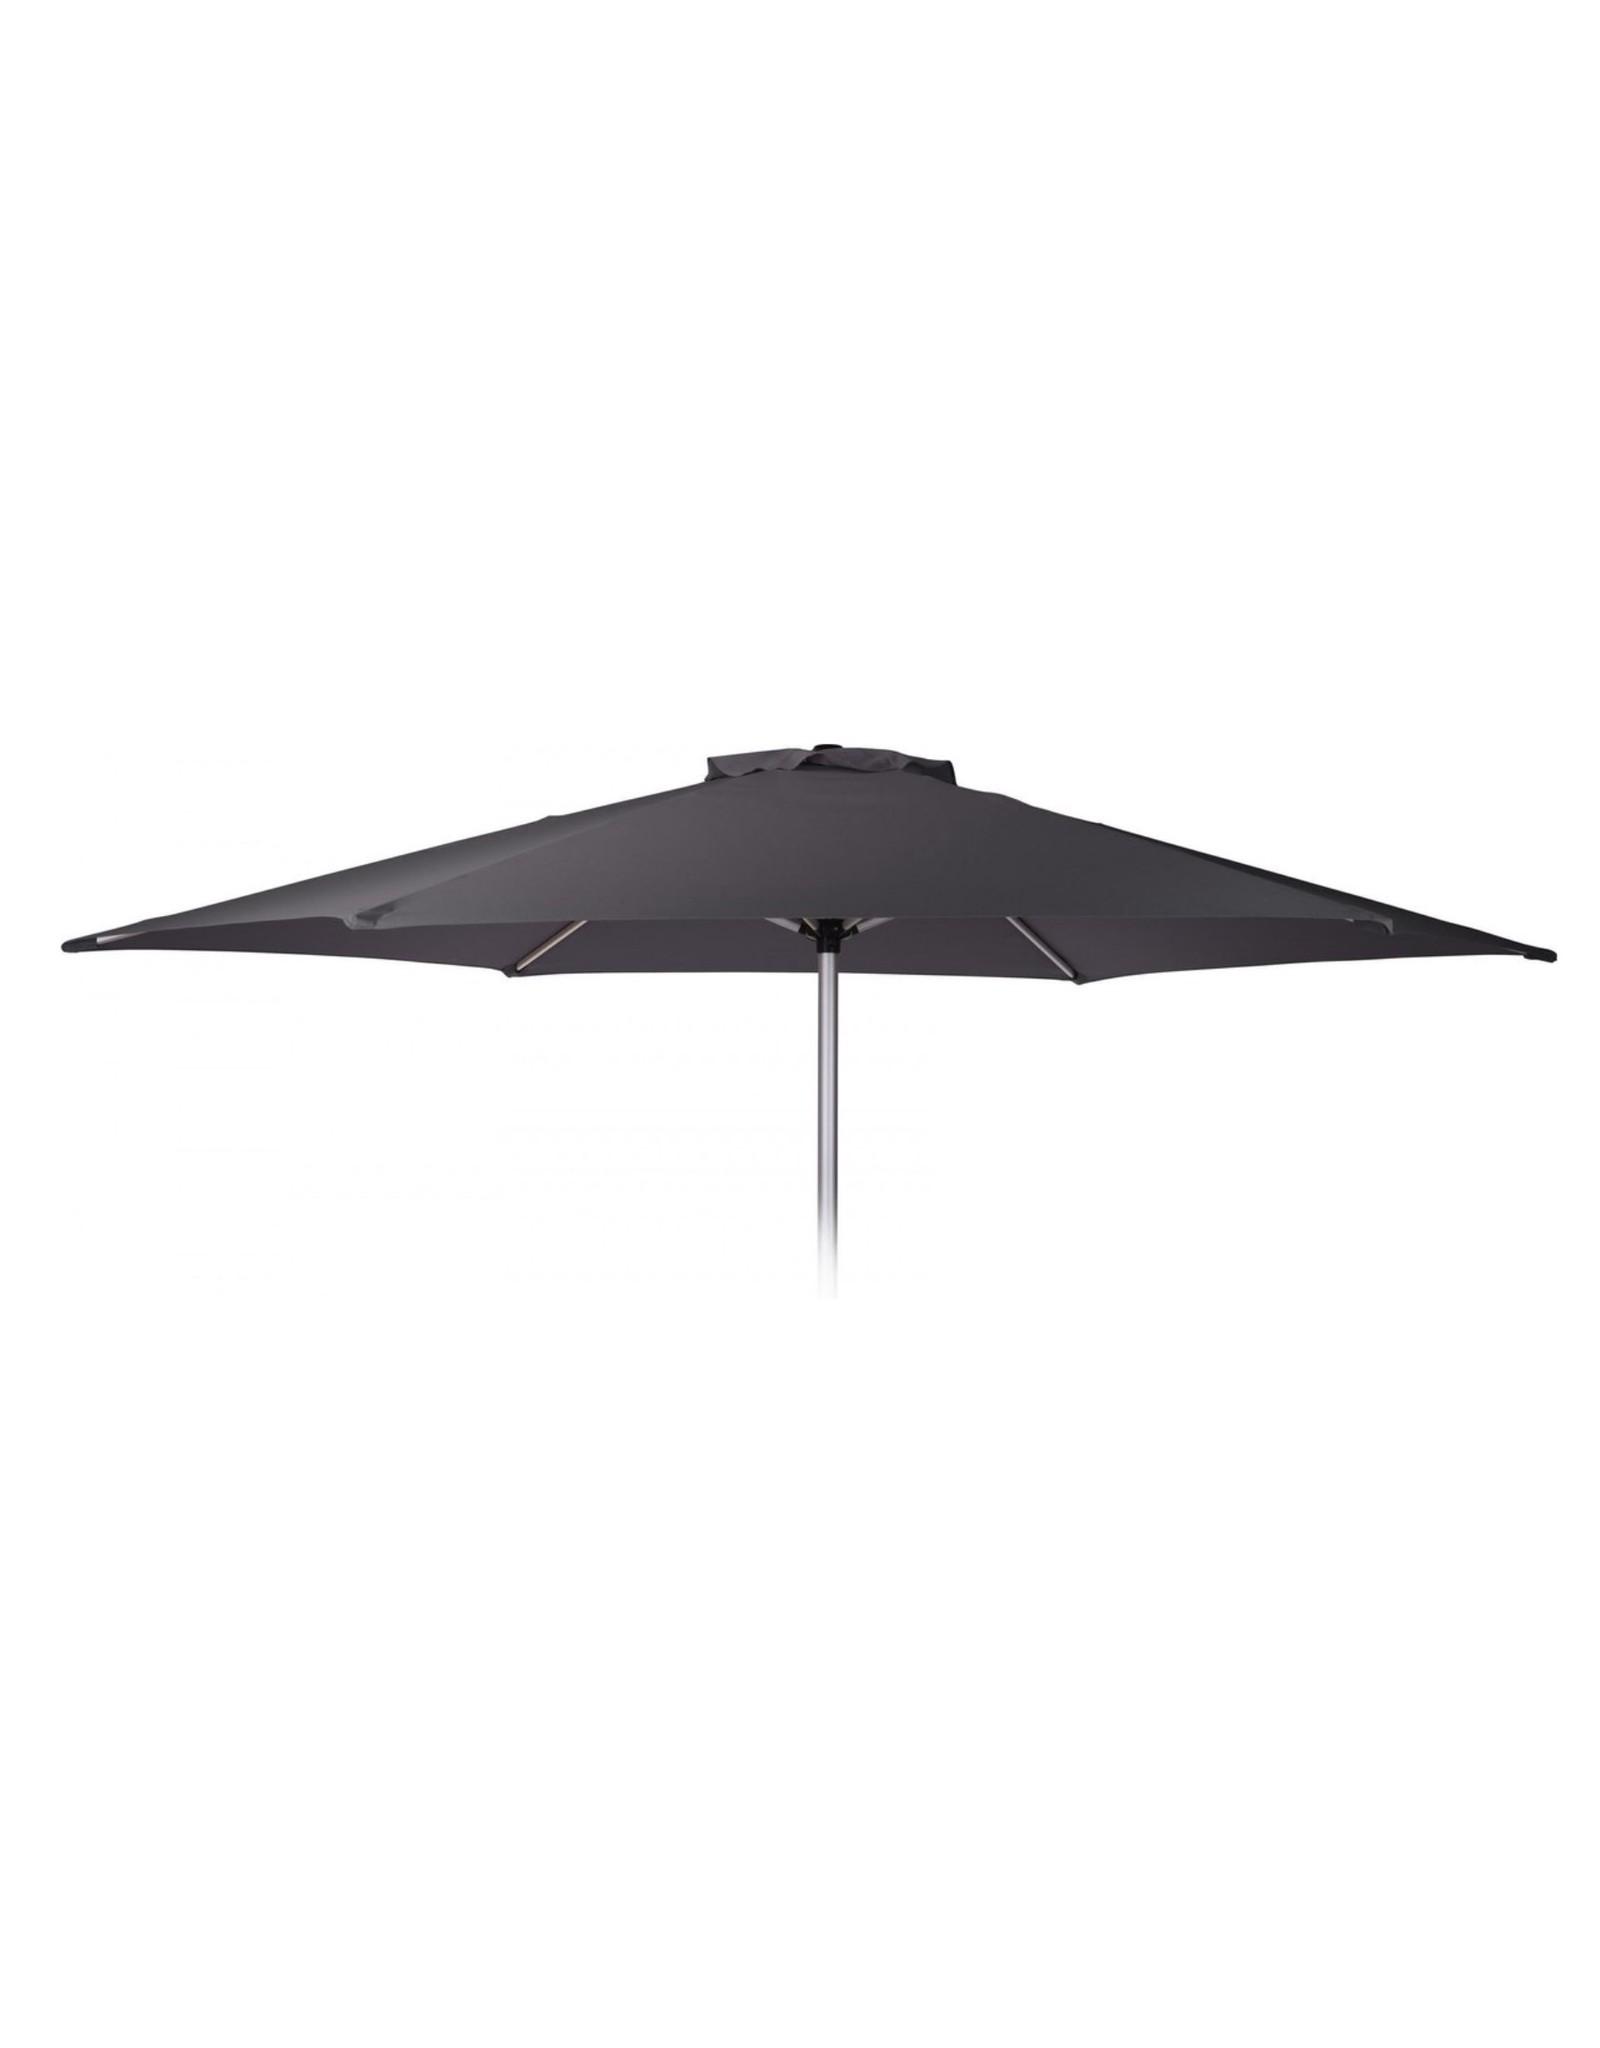 Pro Garden - Parasol - Ø270 cm - Aluminium - Grijs